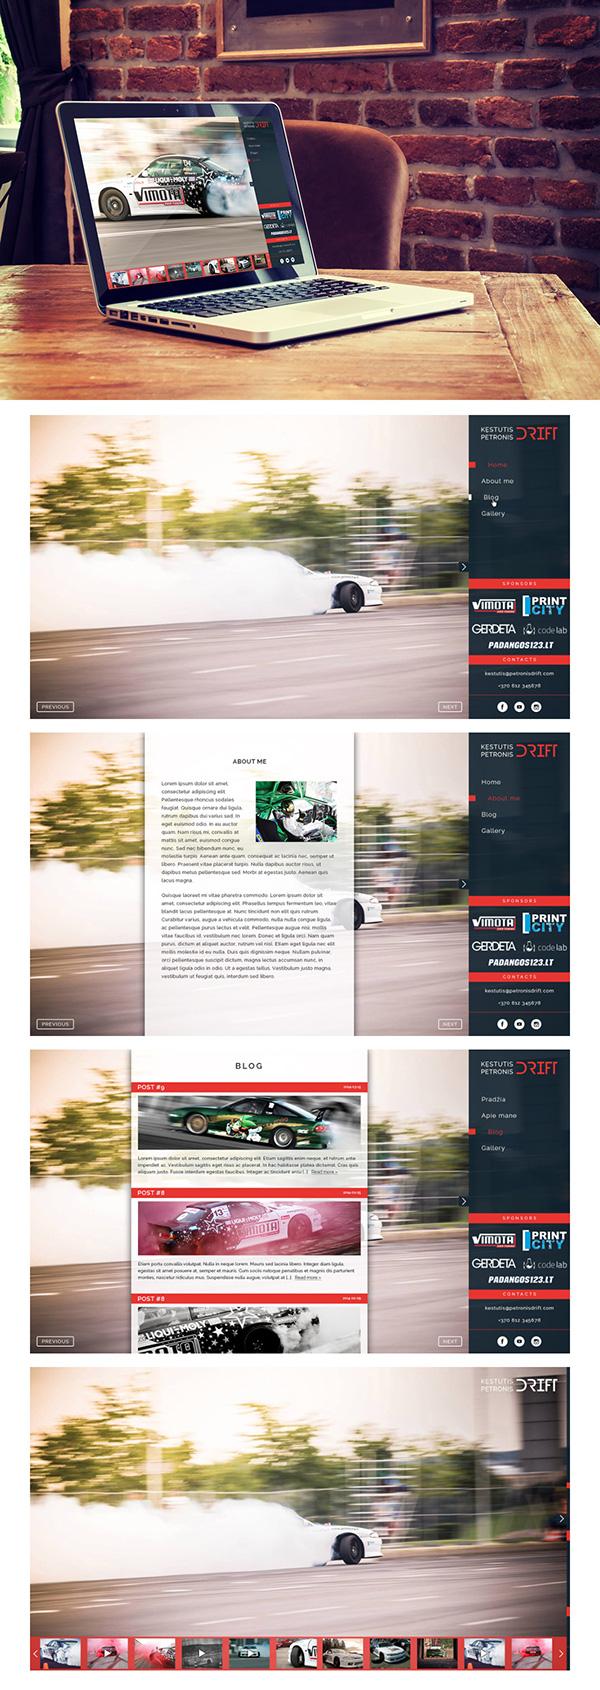 wordpress drifting drift Nissan Cars petronis EEDC